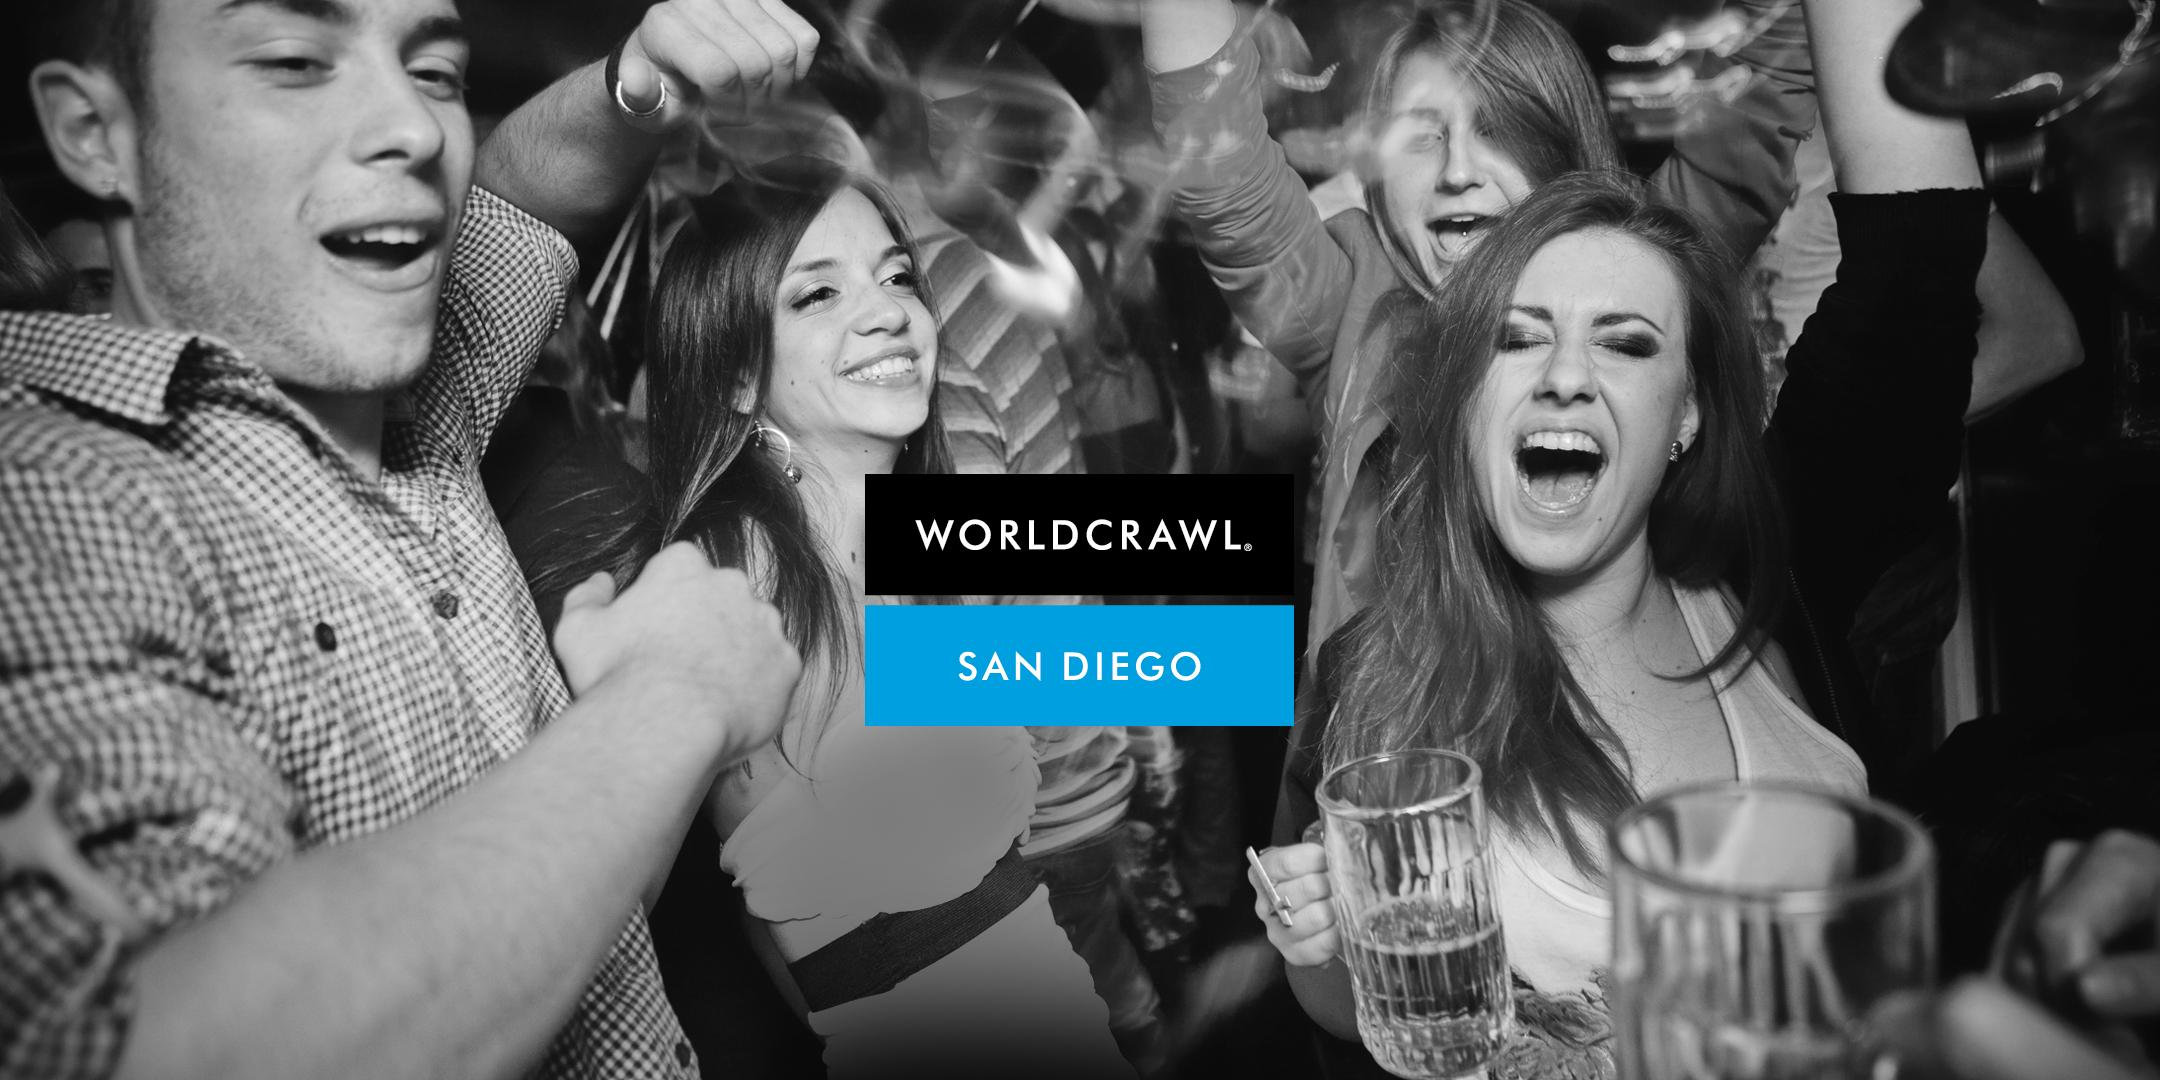 World Crawl™ San Diego - (Upgraded) VIP Crawl. World Crawl™ San Diego - (Upgraded) VIP Crawl